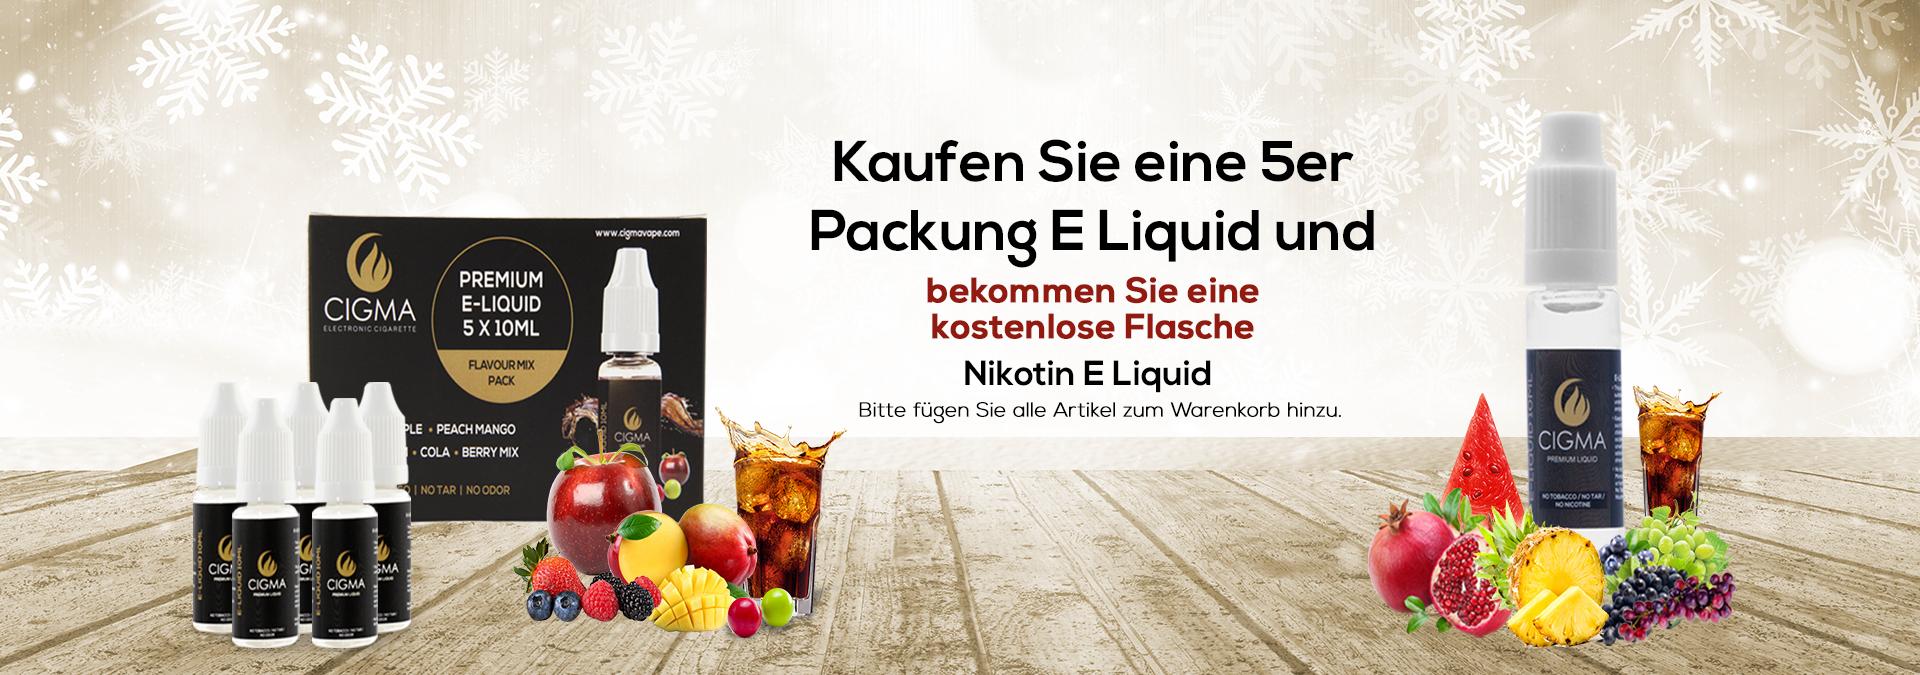 Winter-theme-For-cigmavape-German-Banner-2